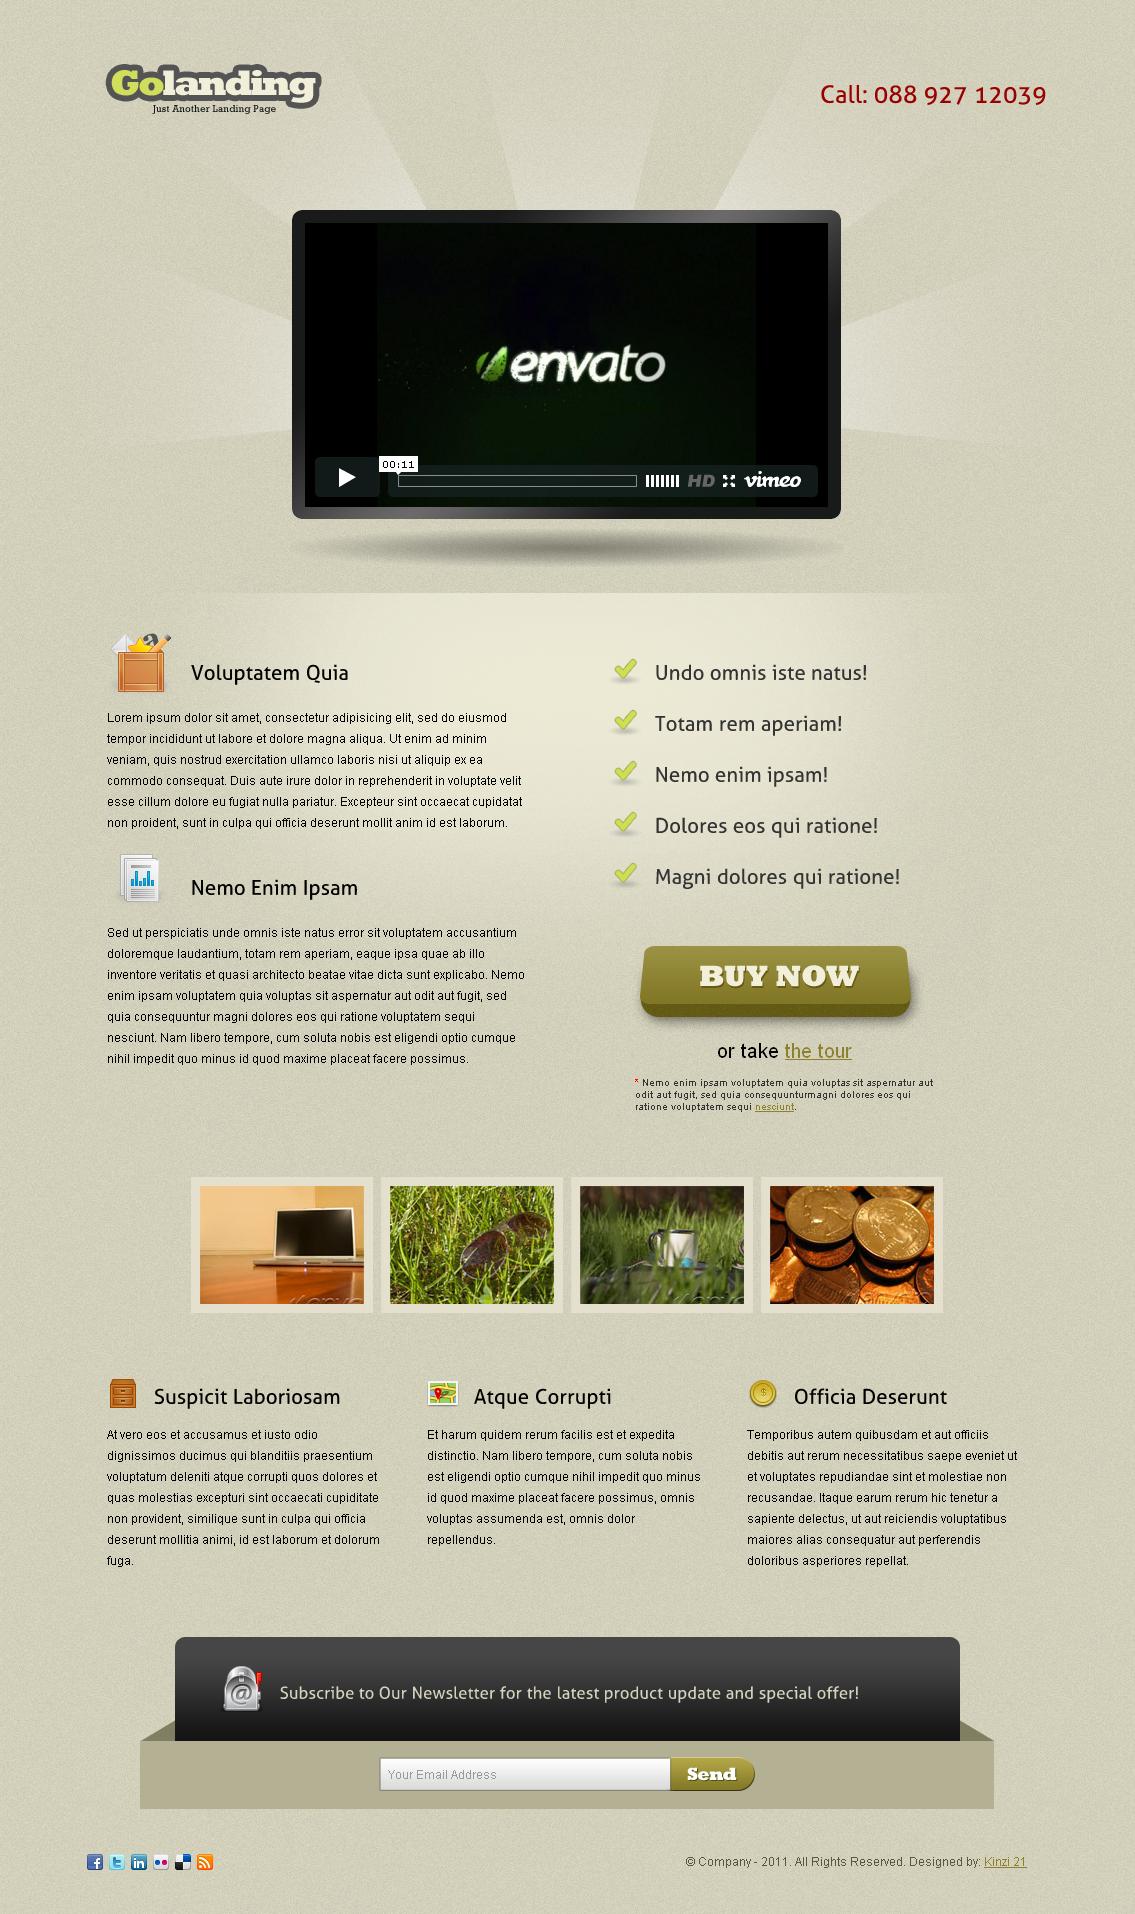 Golanding - A Creative-Clean Landing Page